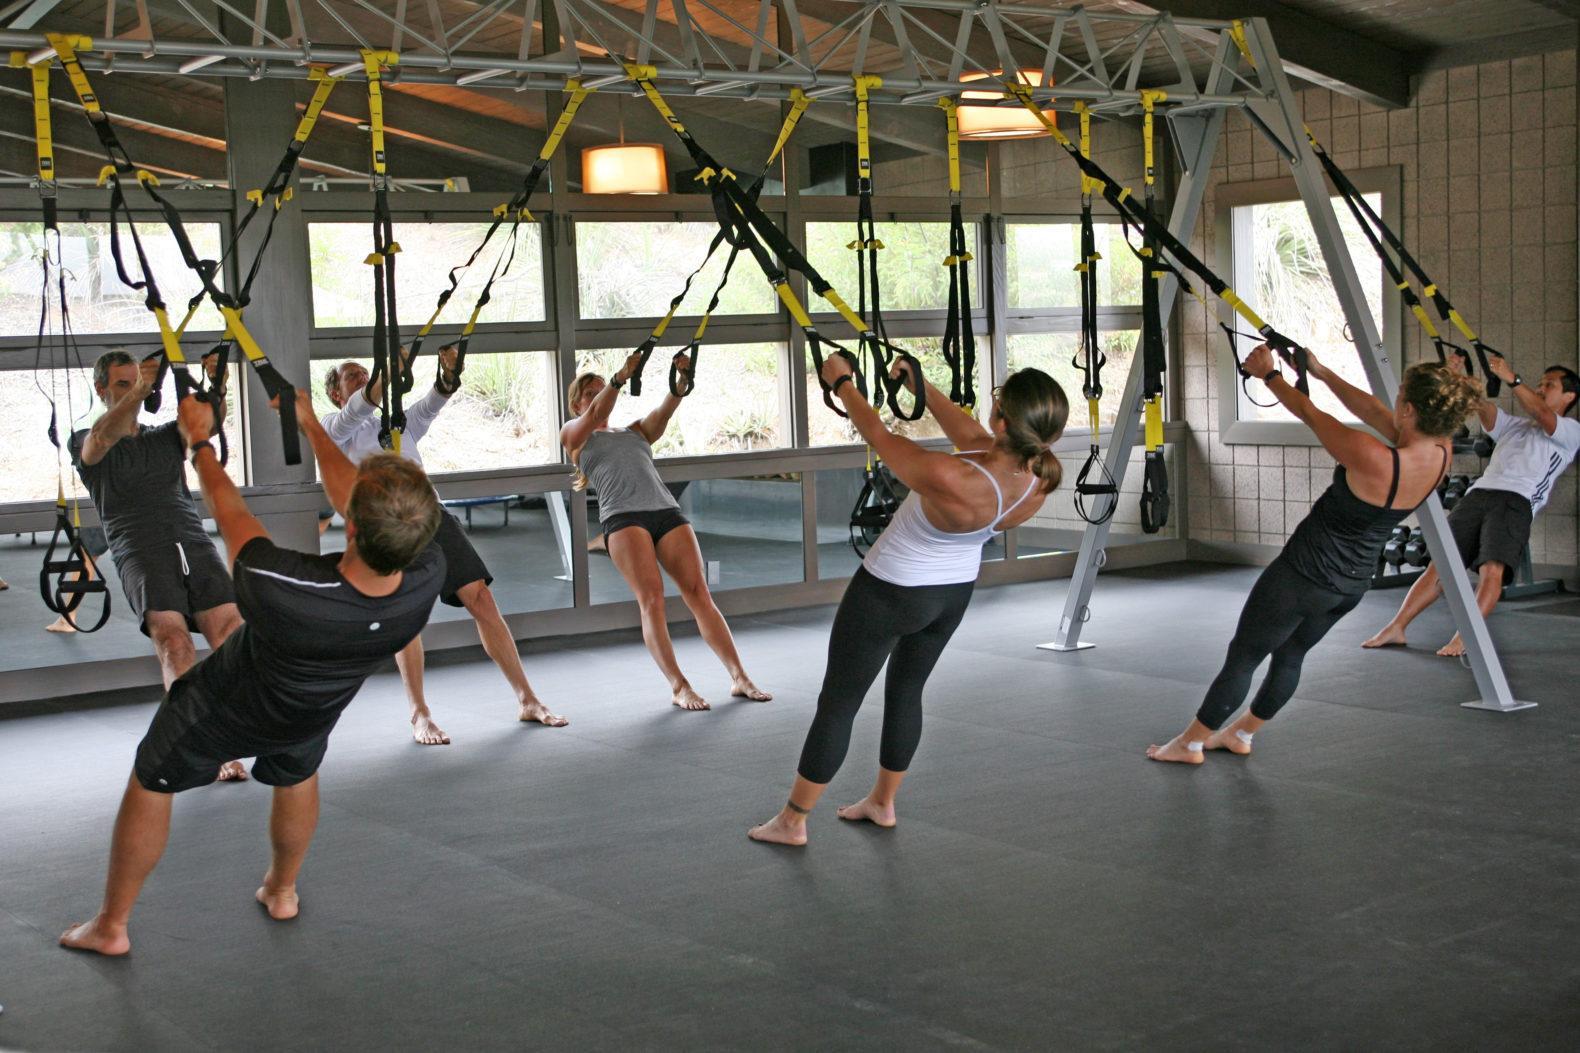 sports-activities-trx-workout-group-the-ranch-at-live-oak-malibu-usa-america